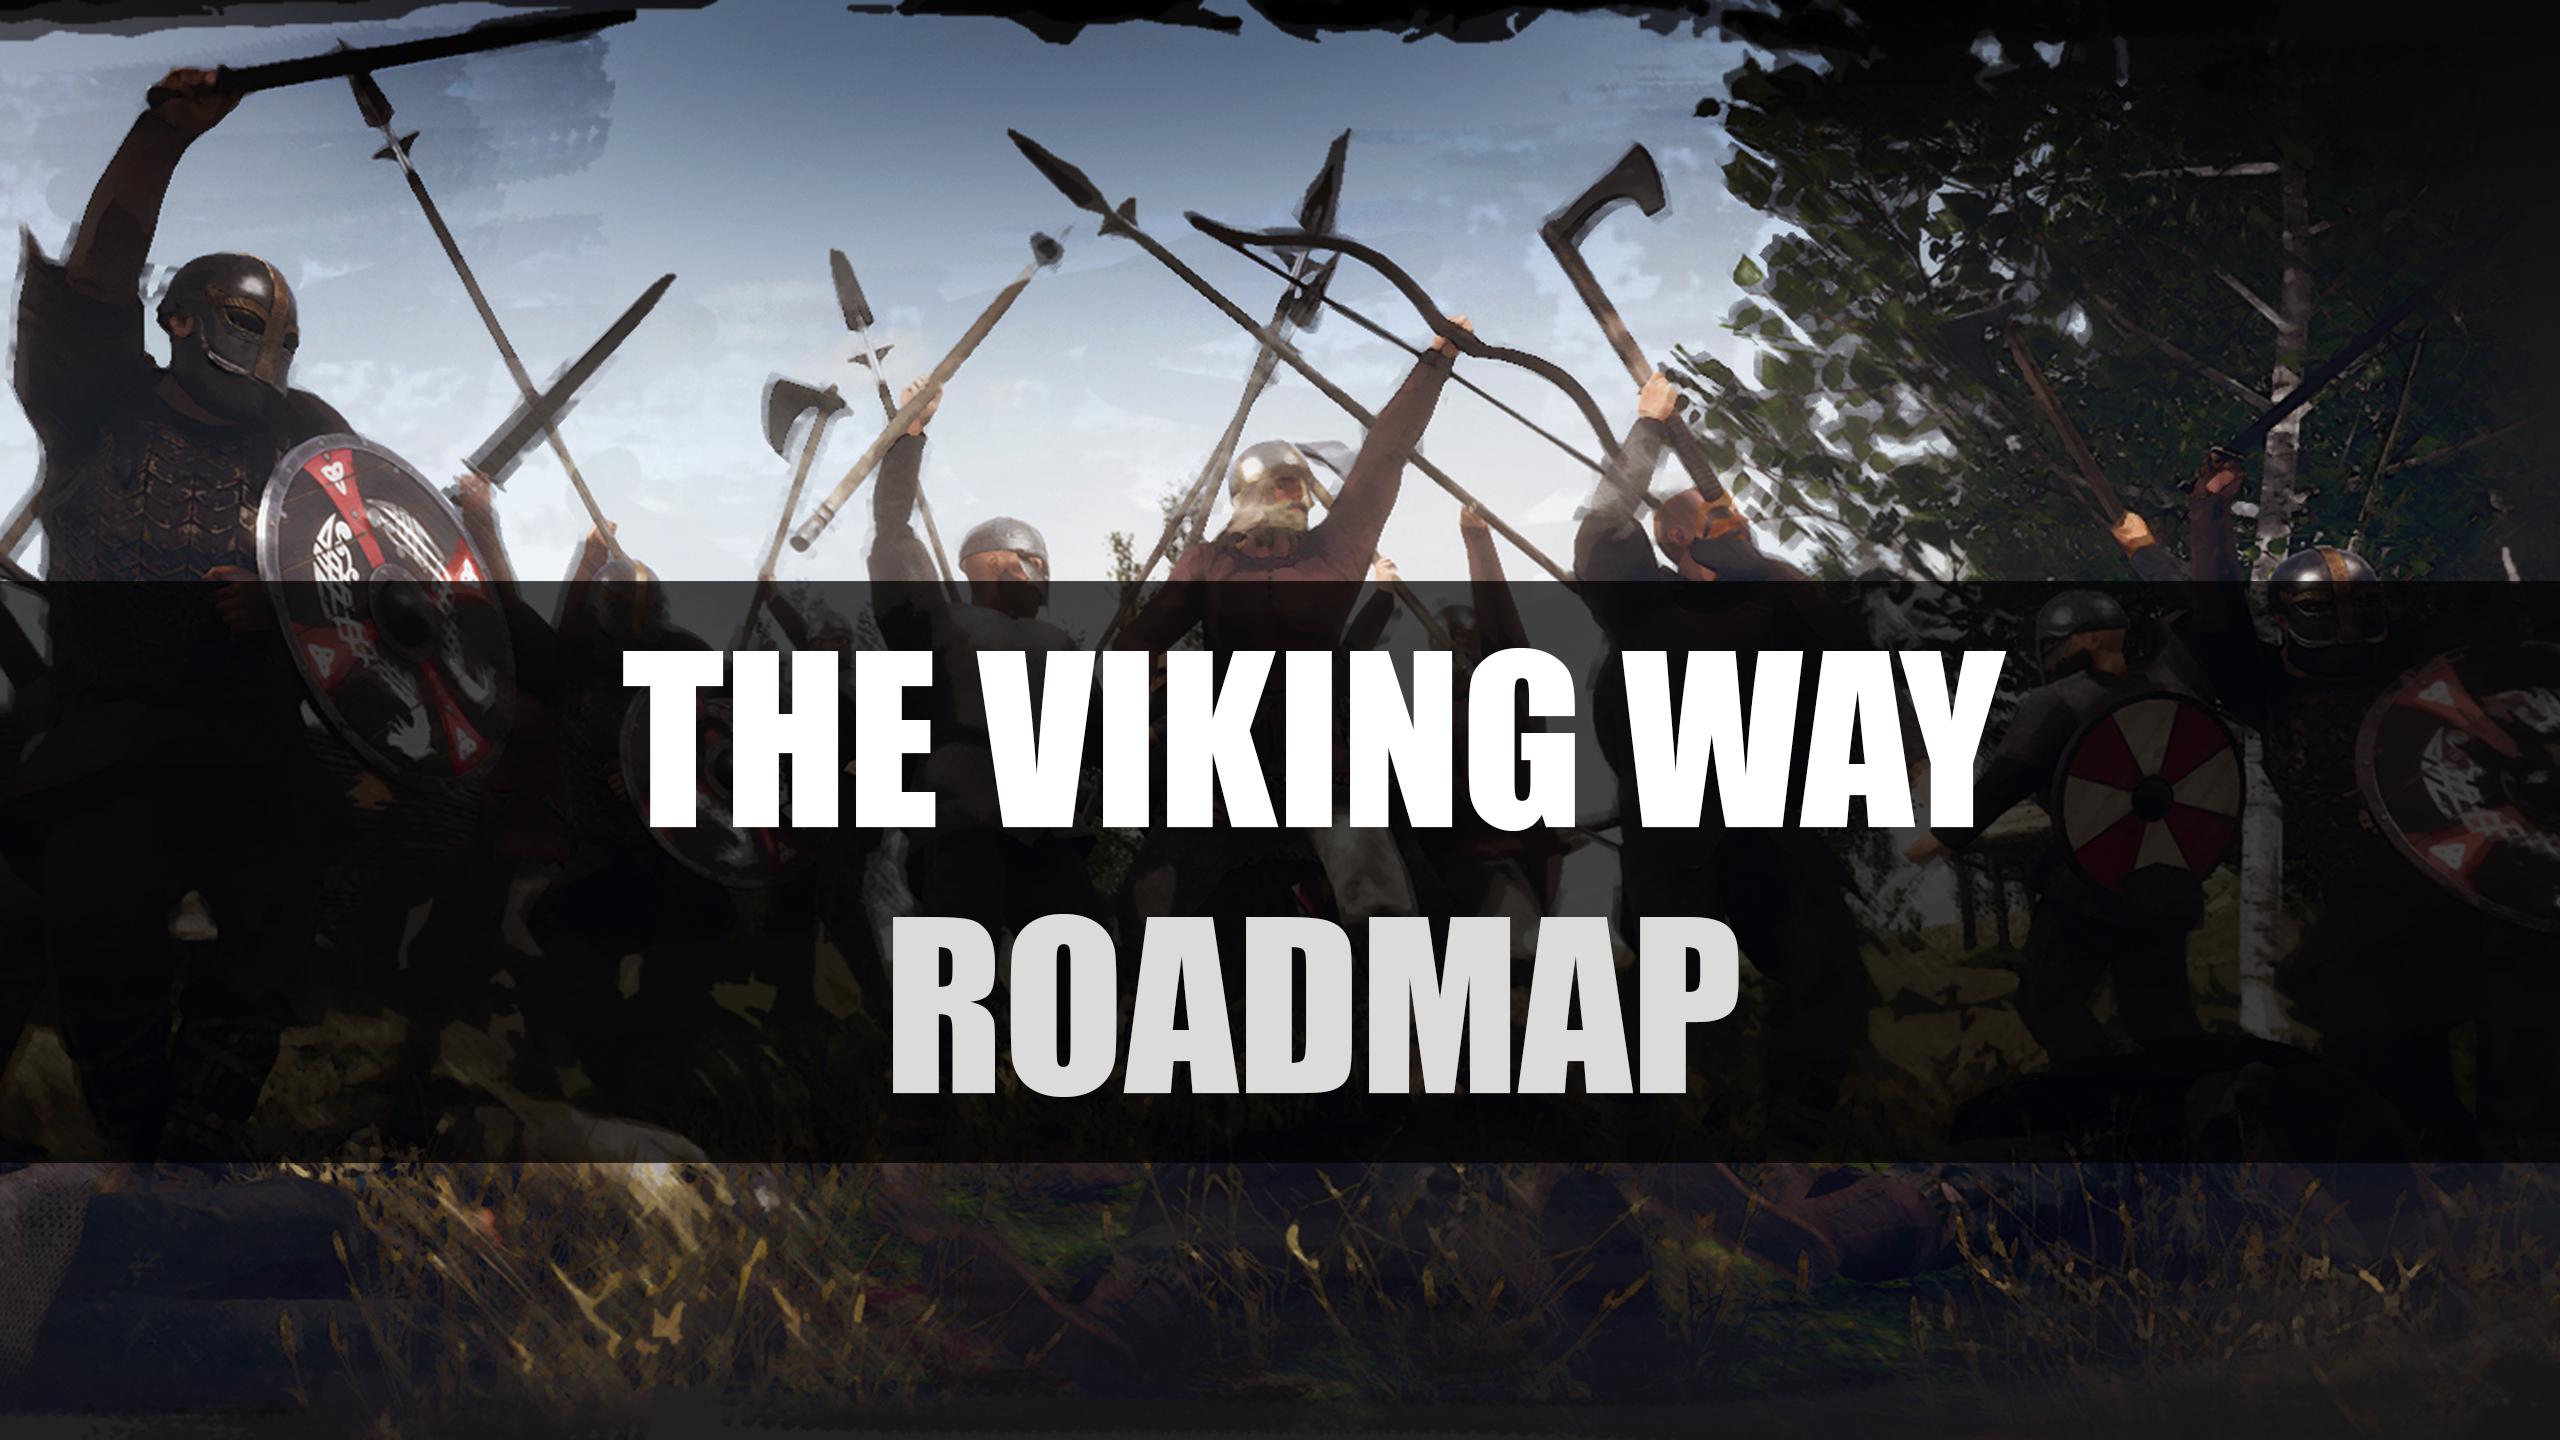 The Viking Way Roadmap